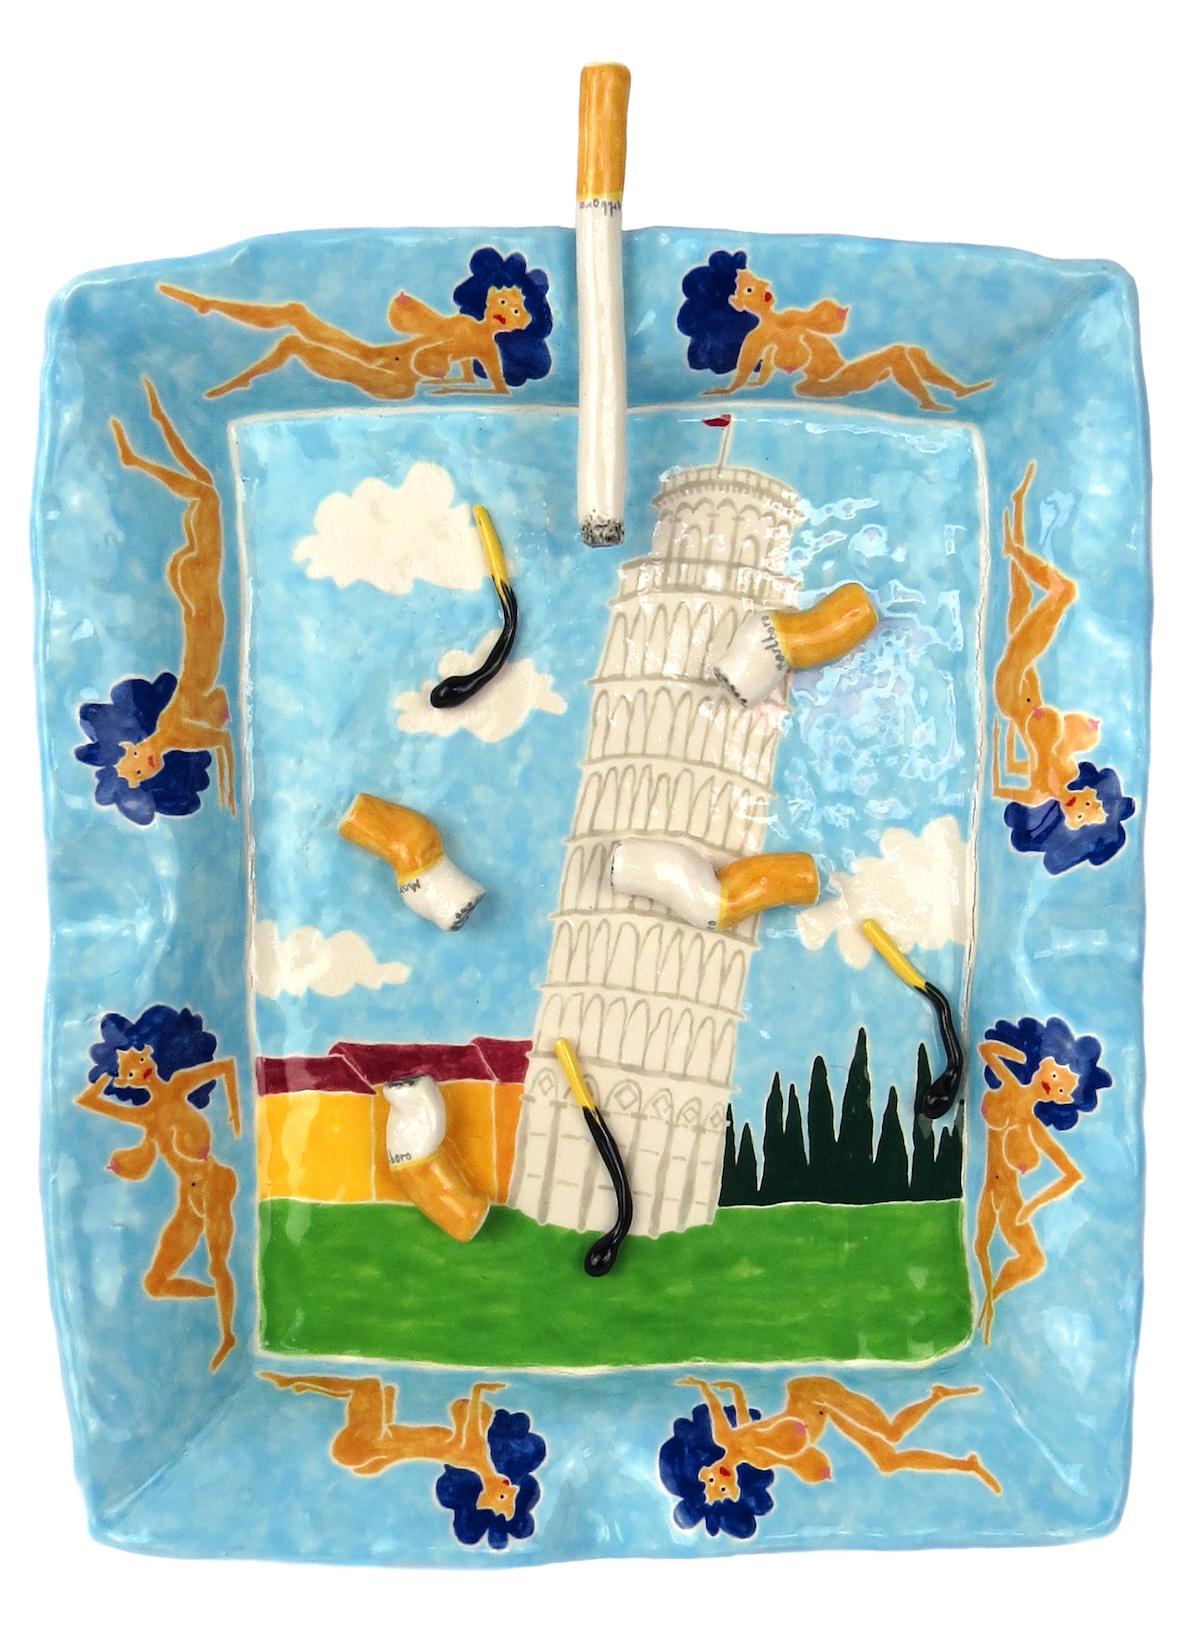 © Katy Stubbs, Leaning Tower of Pisa, 2018